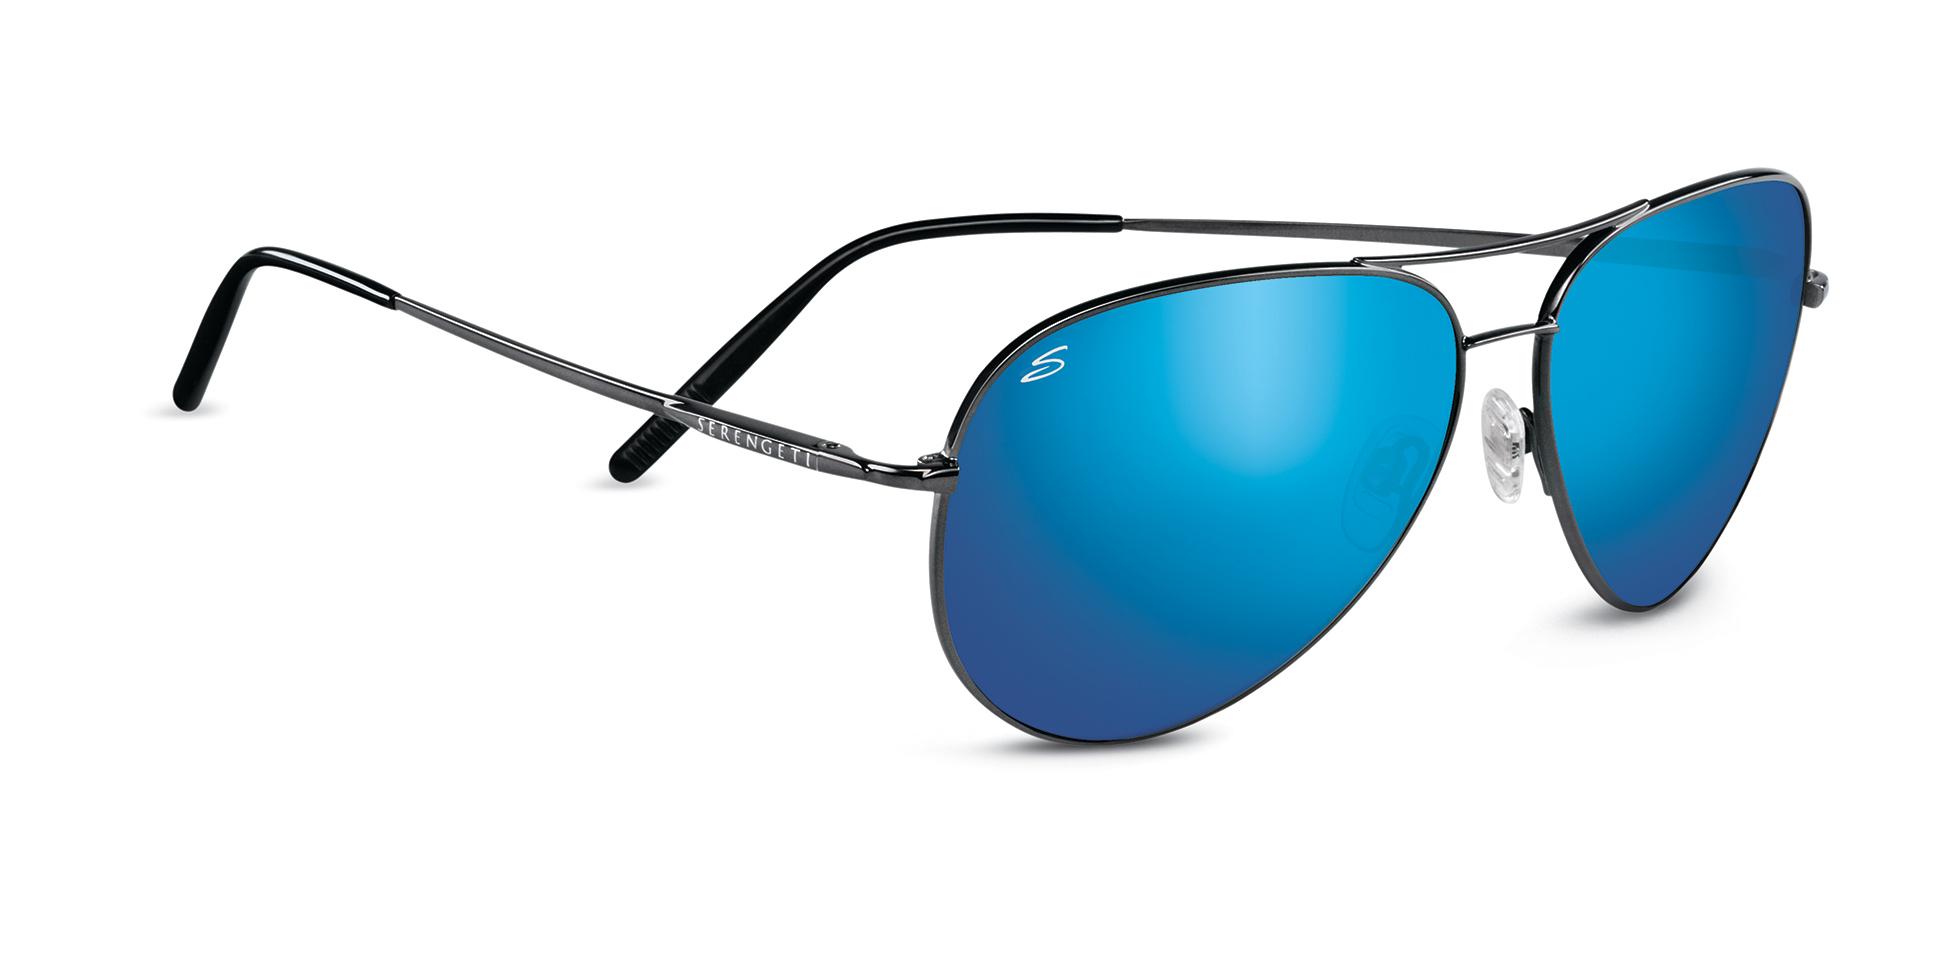 9cc7102b7f83 Serengeti Aviator Sunglasses On Sale